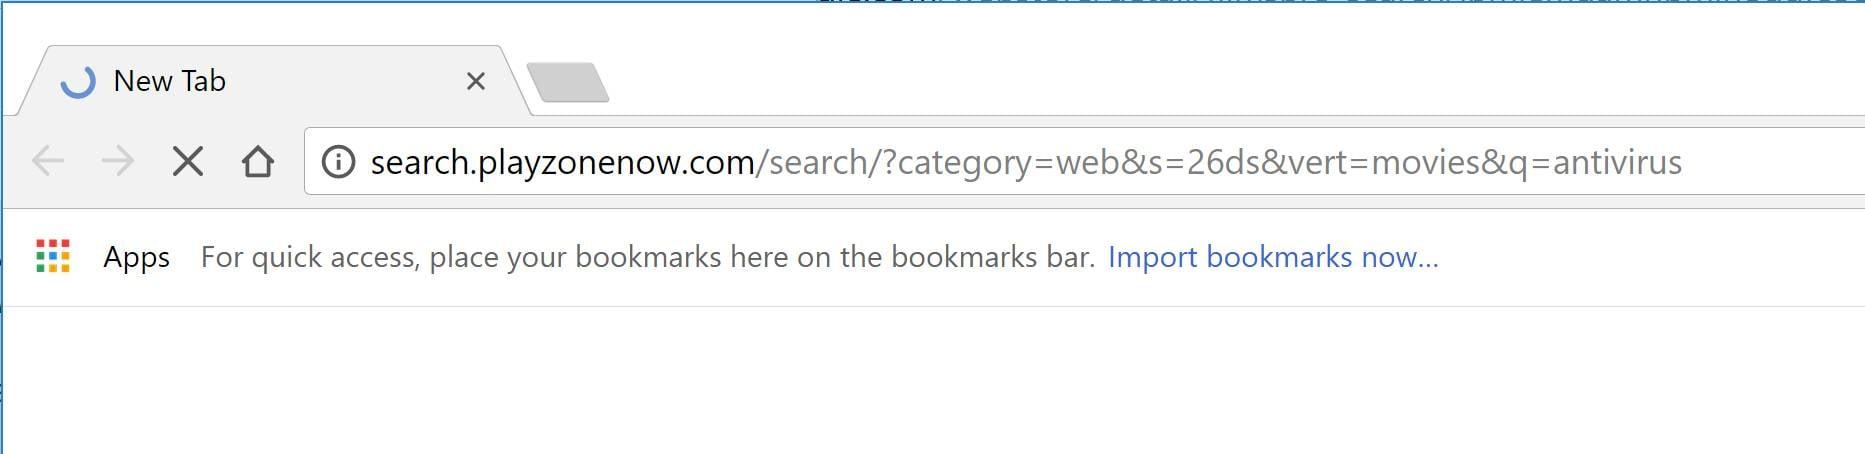 Search.playzonenow.com redirect virus